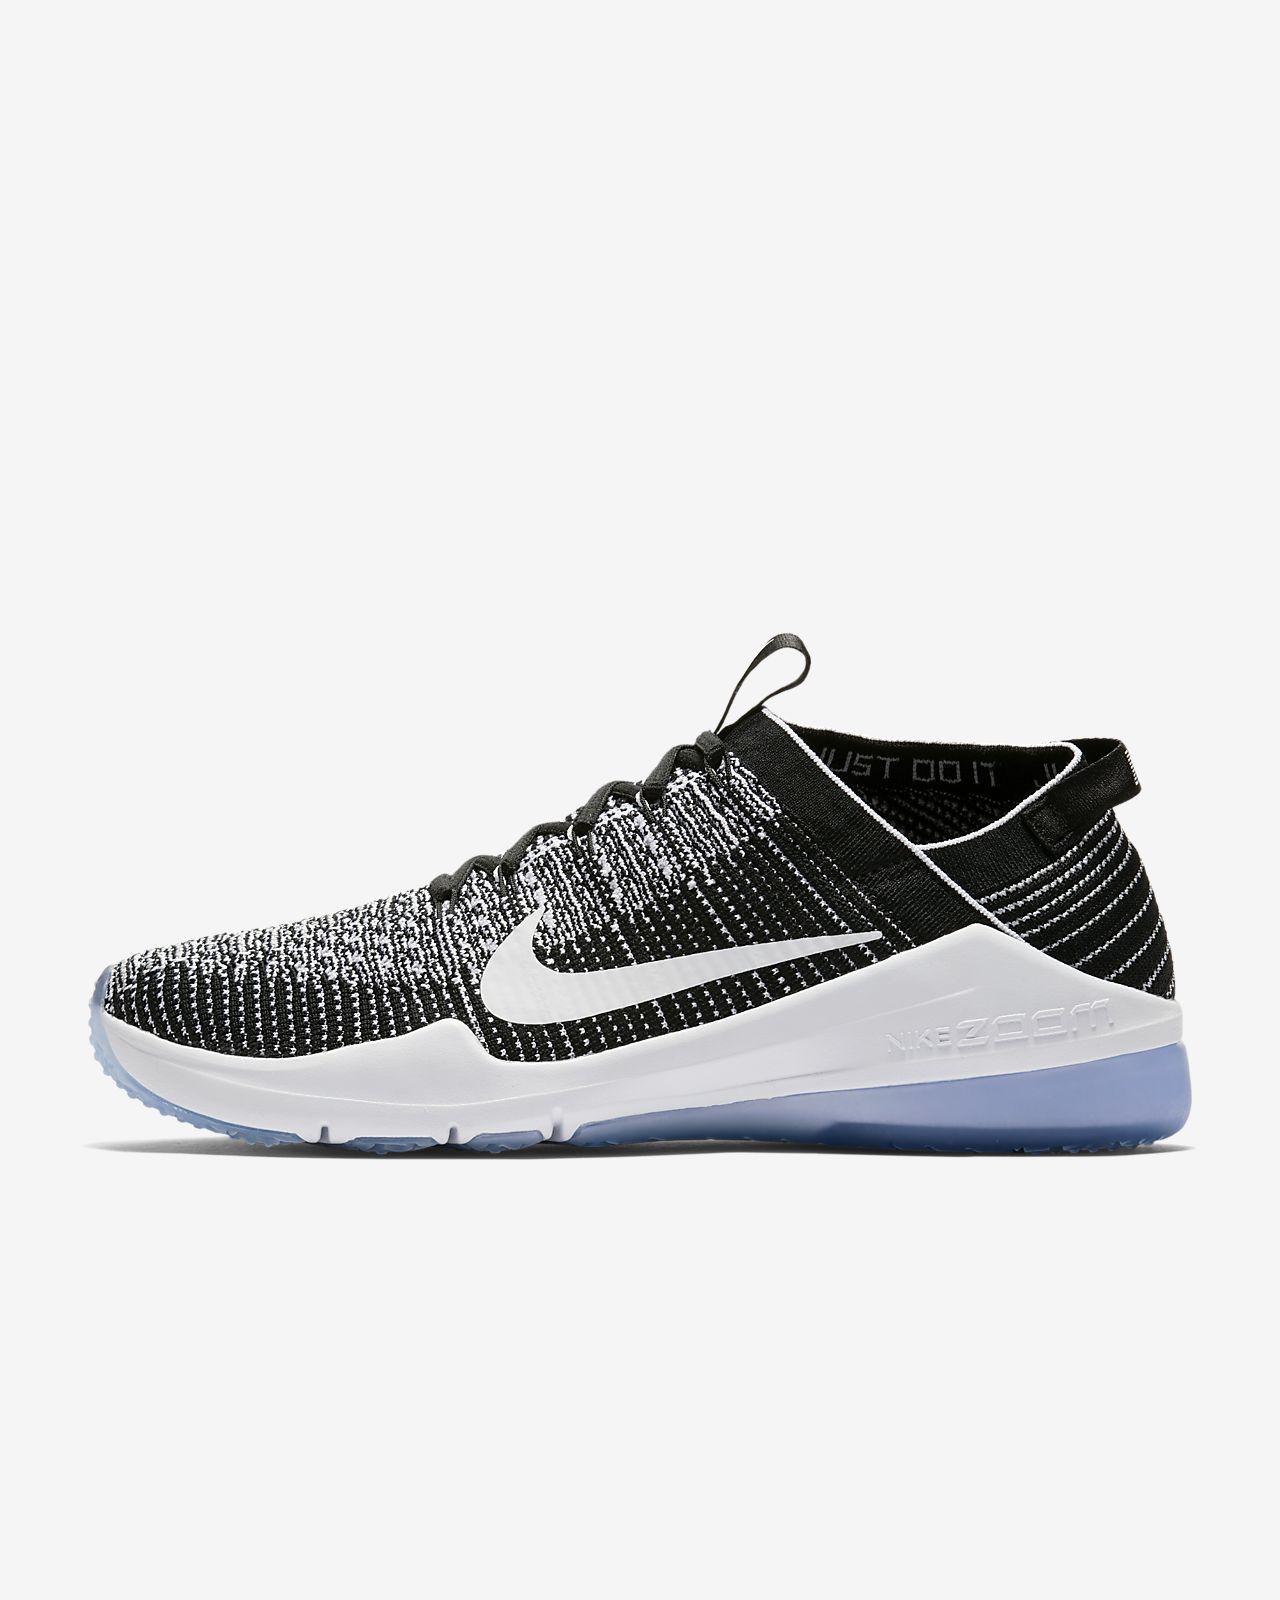 Женские кроссовки для бокса, тренинга и занятий в зале Nike Air Zoom Fearless Flyknit 2